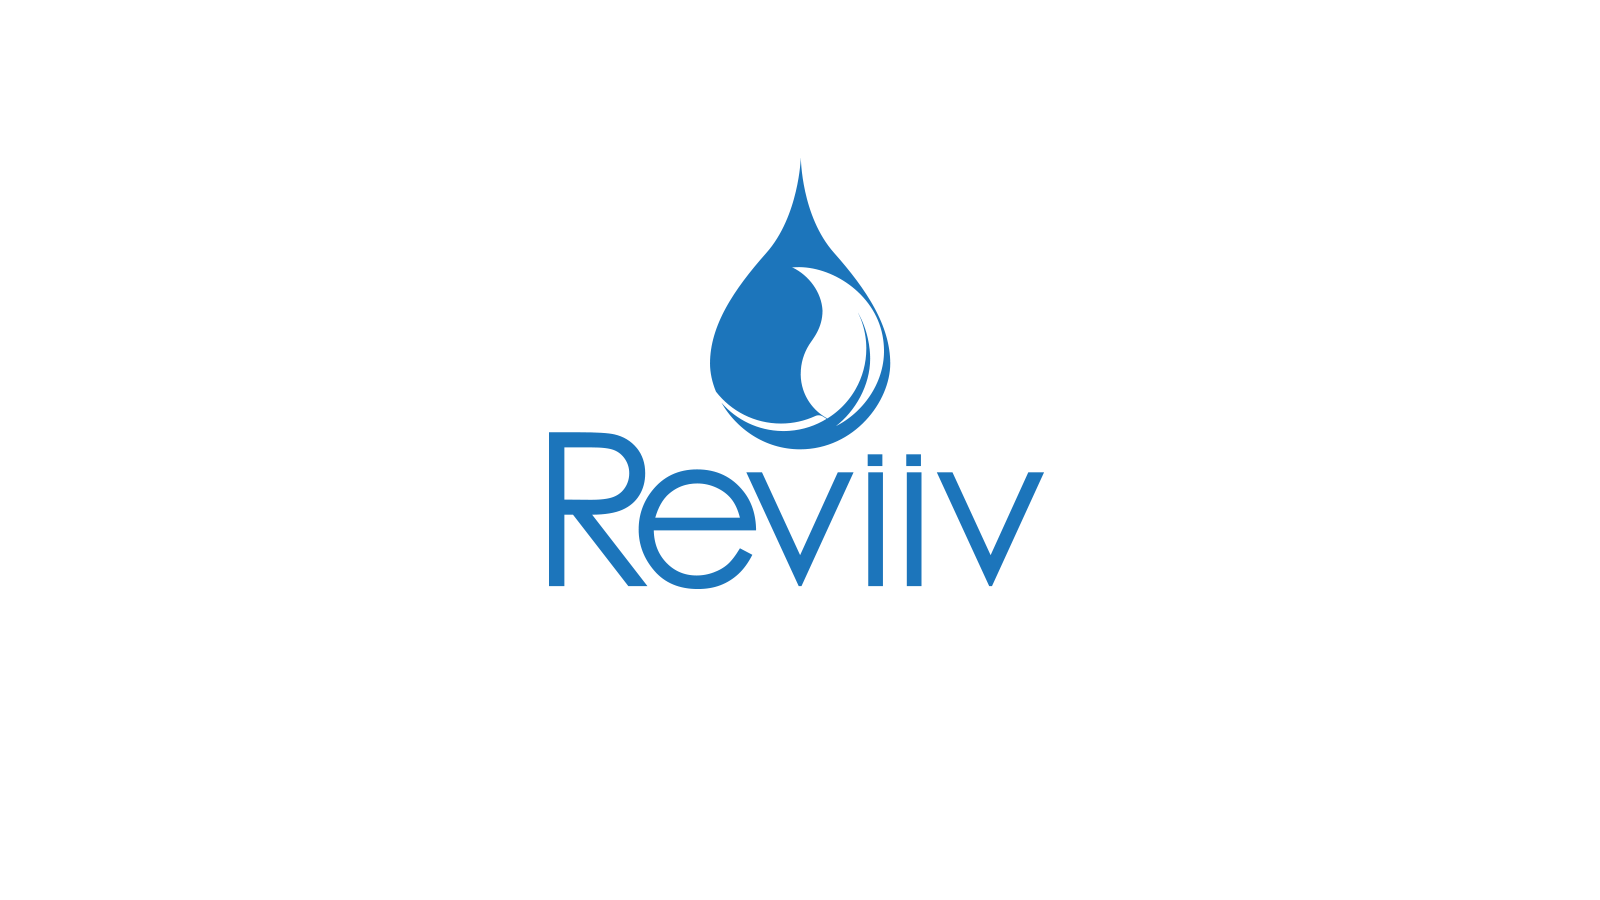 Reviiv Branding Project